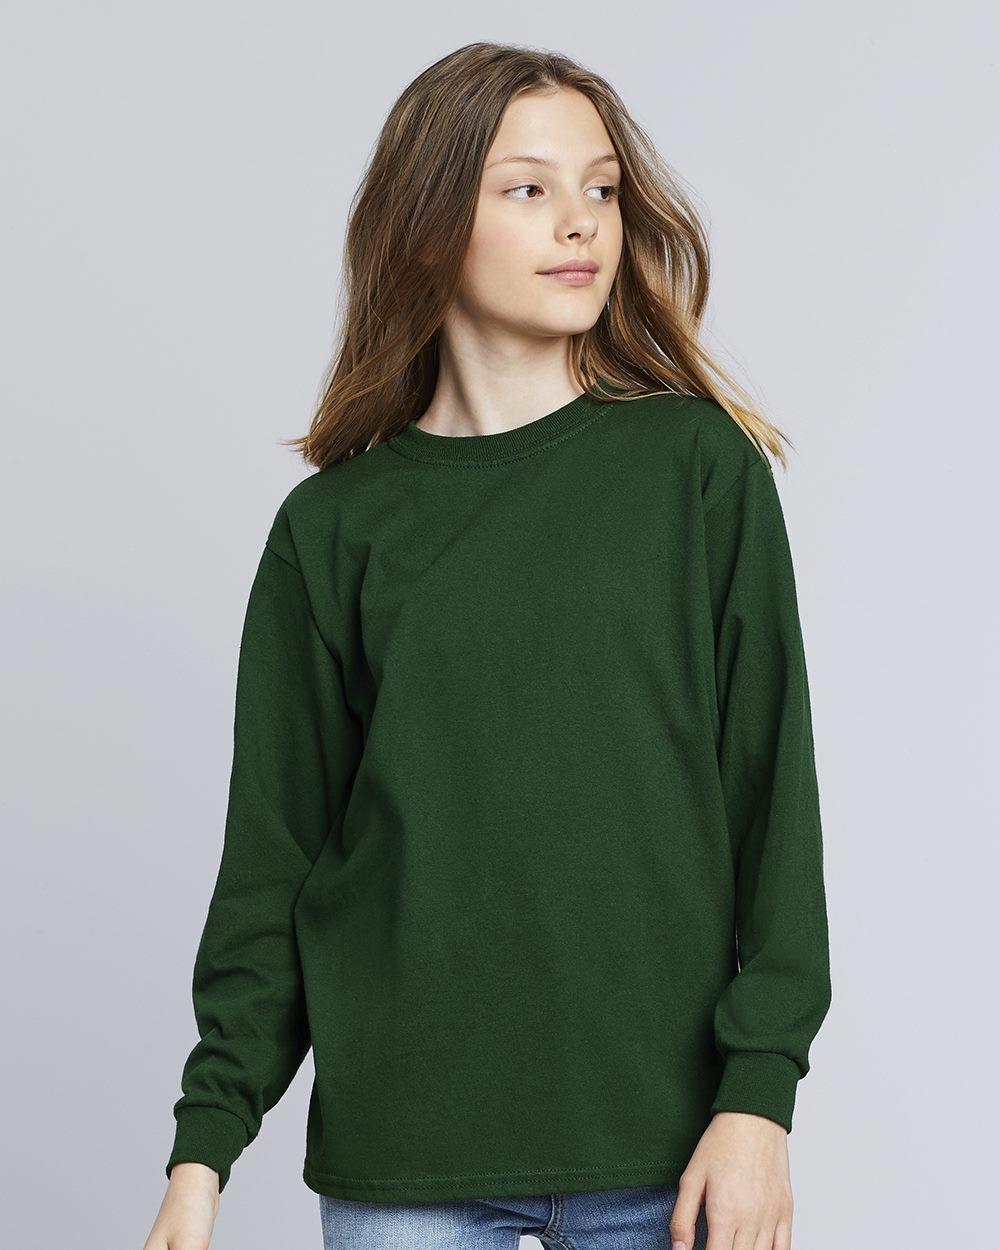 Gildan 5400B - Heavy Cotton Youth Long Sleeve T-Shirt